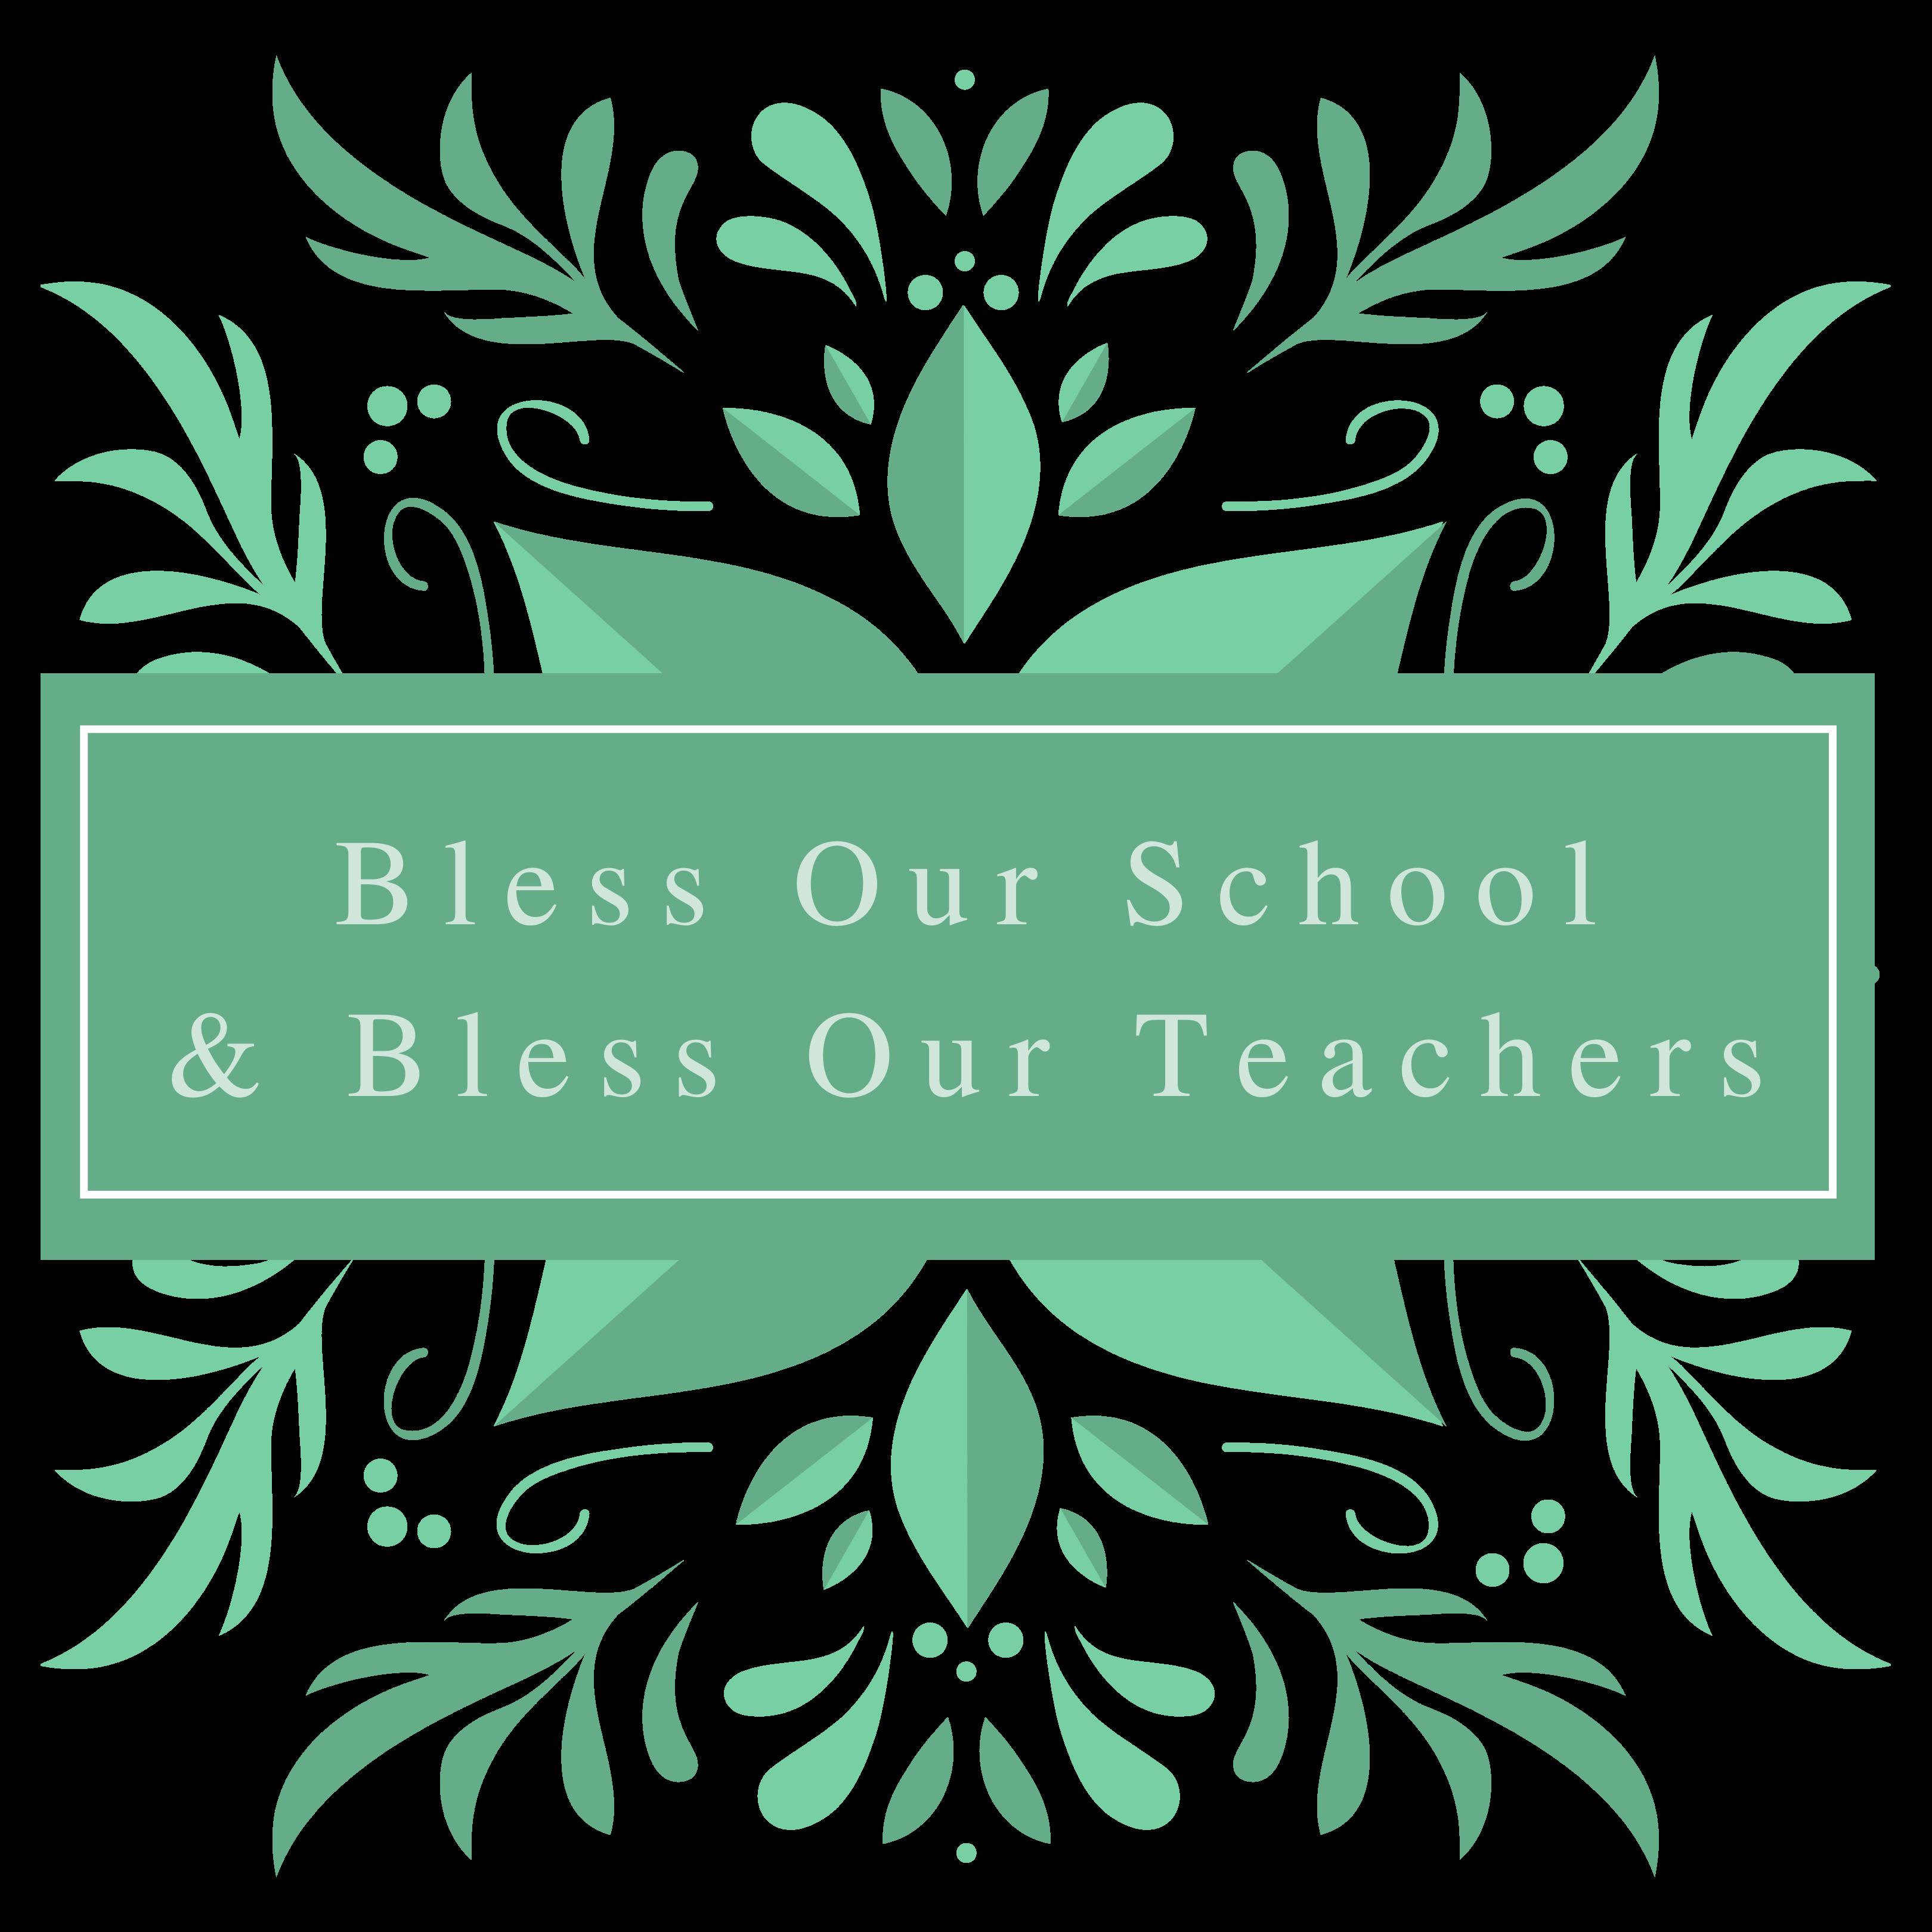 Bless Our School & Bless Our Teachers